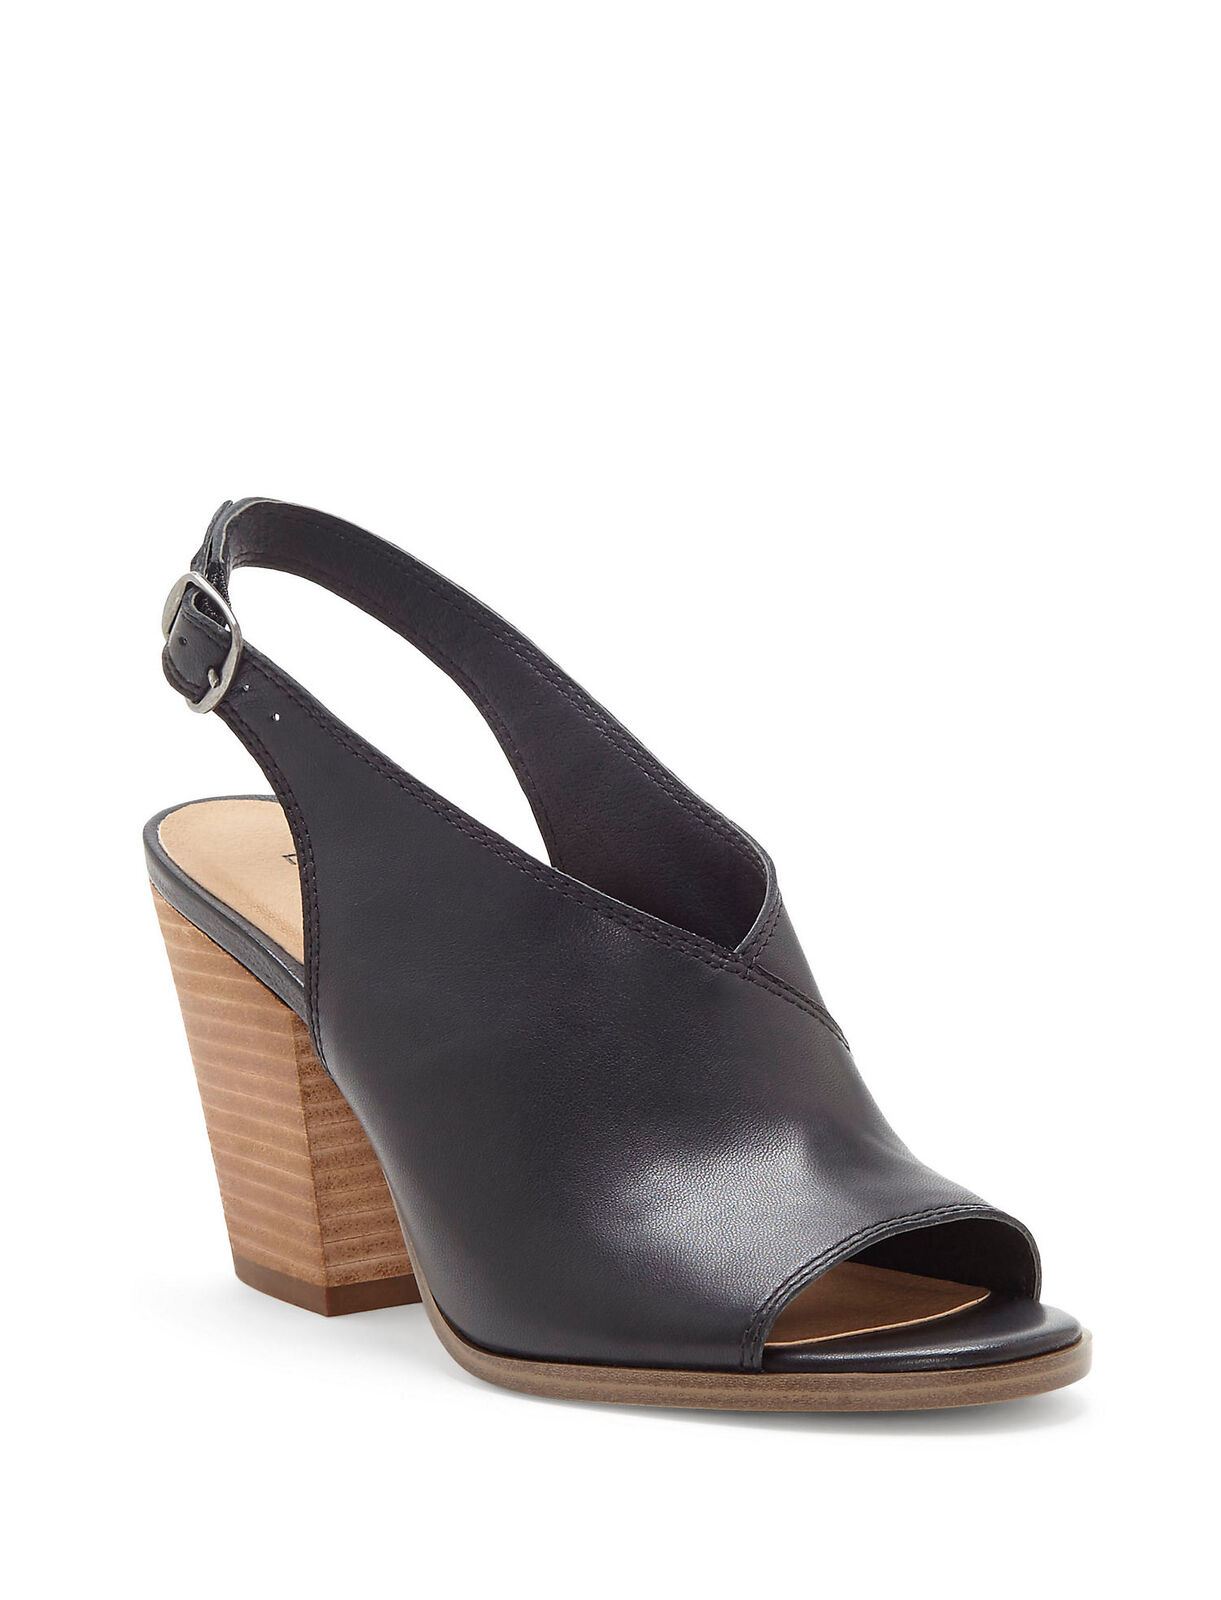 80% di sconto Lucky Brand donna Ovrandie Ovrandie Ovrandie Slingback Peep Toe Heel  fino al 50% di sconto